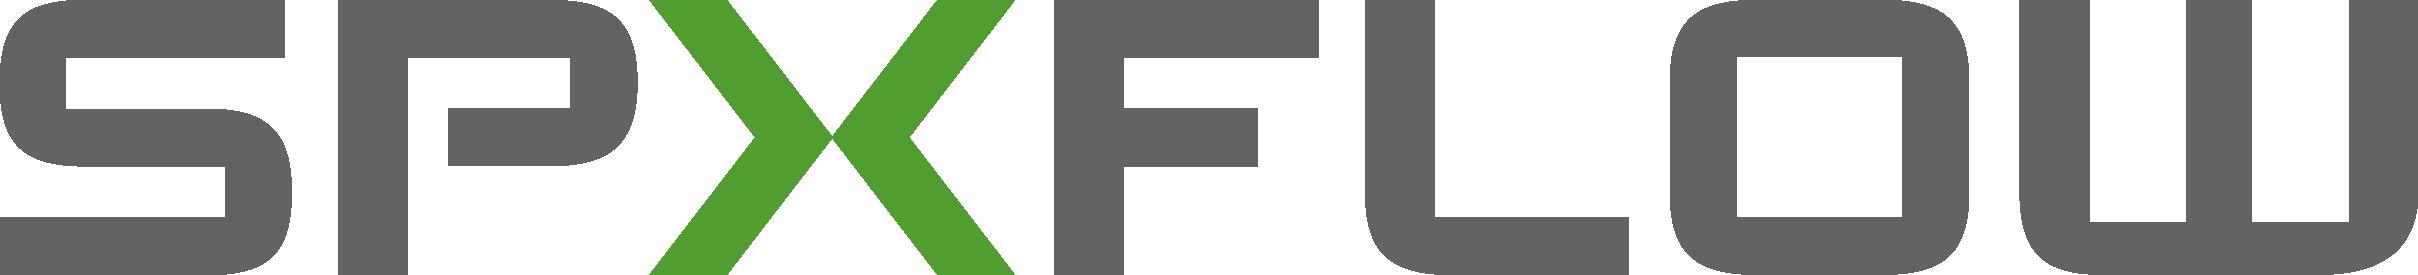 SPXFLOWLogoTransparent